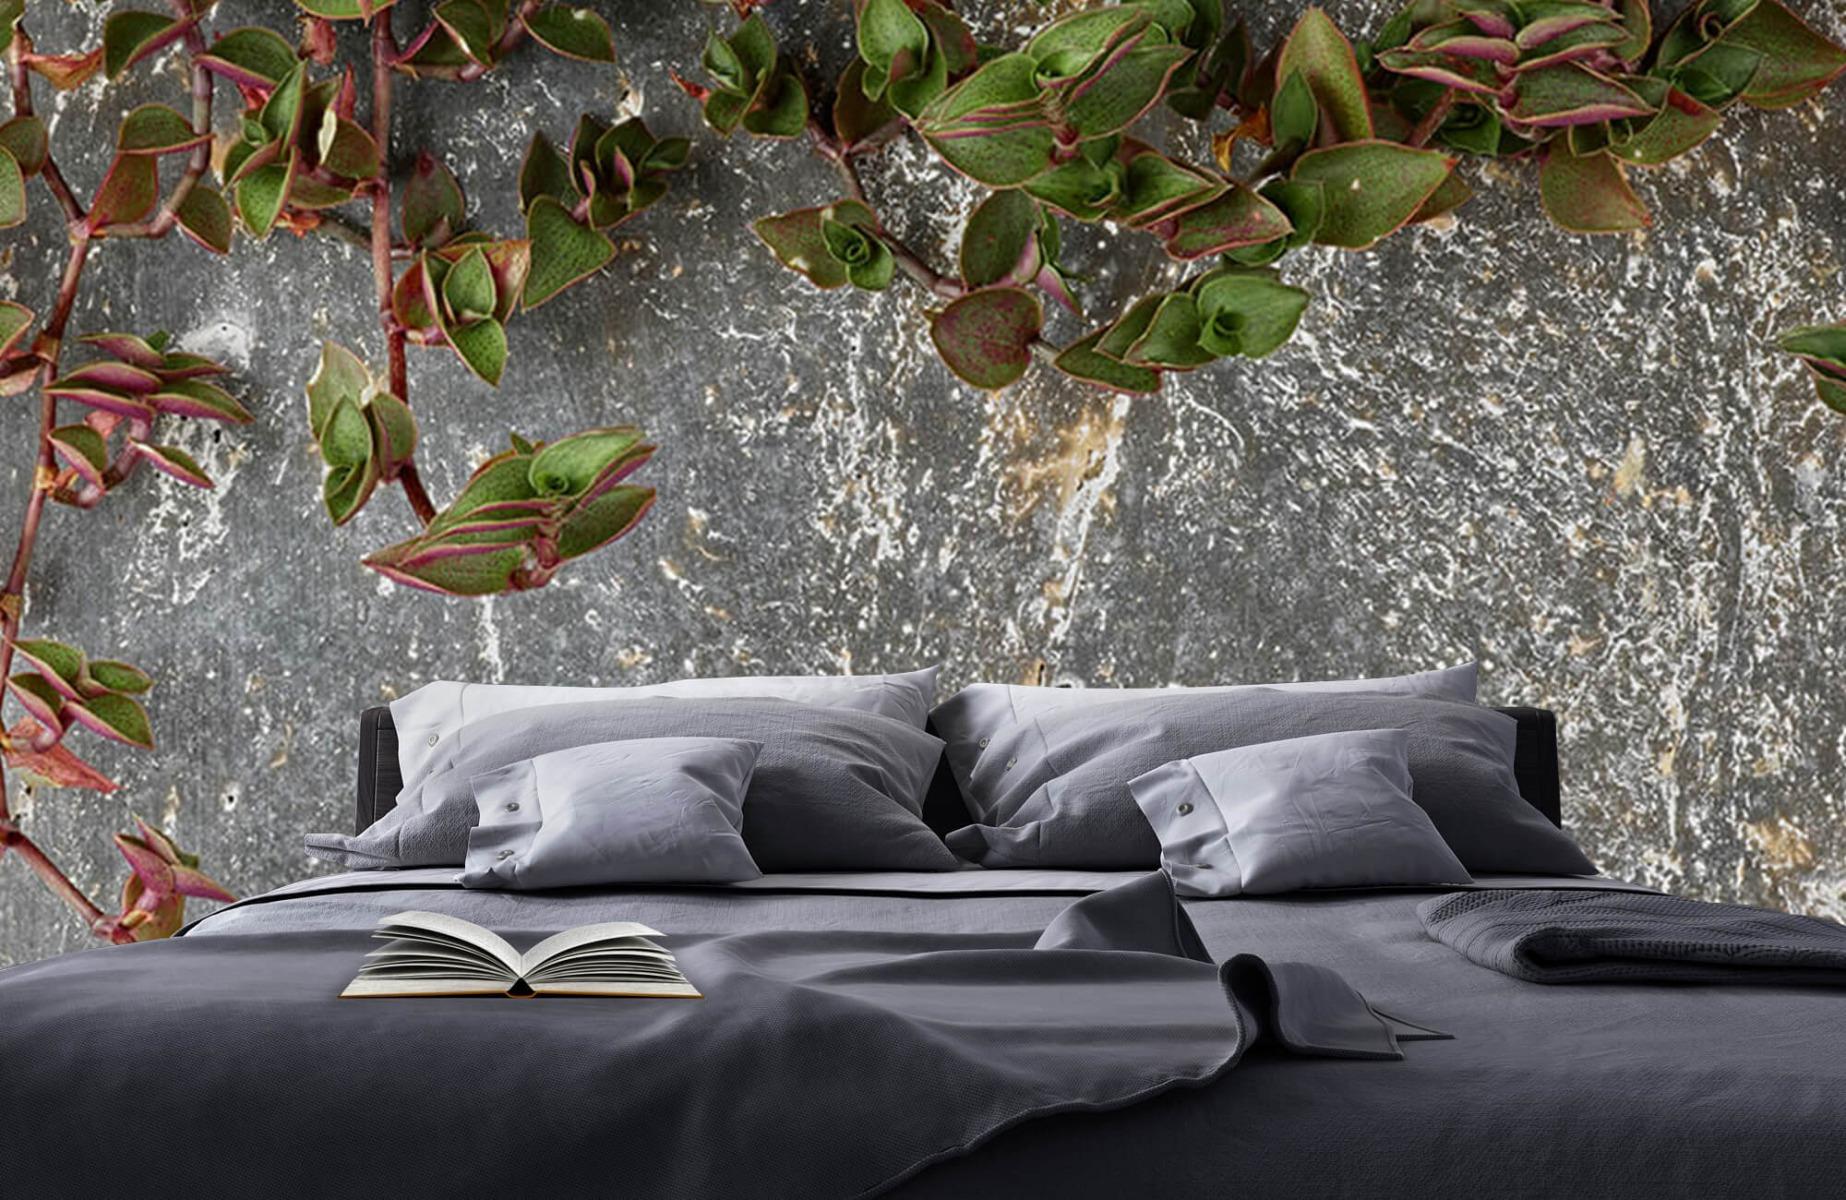 Bladeren - Plantenbak - Wallexclusive - Slaapkamer 17